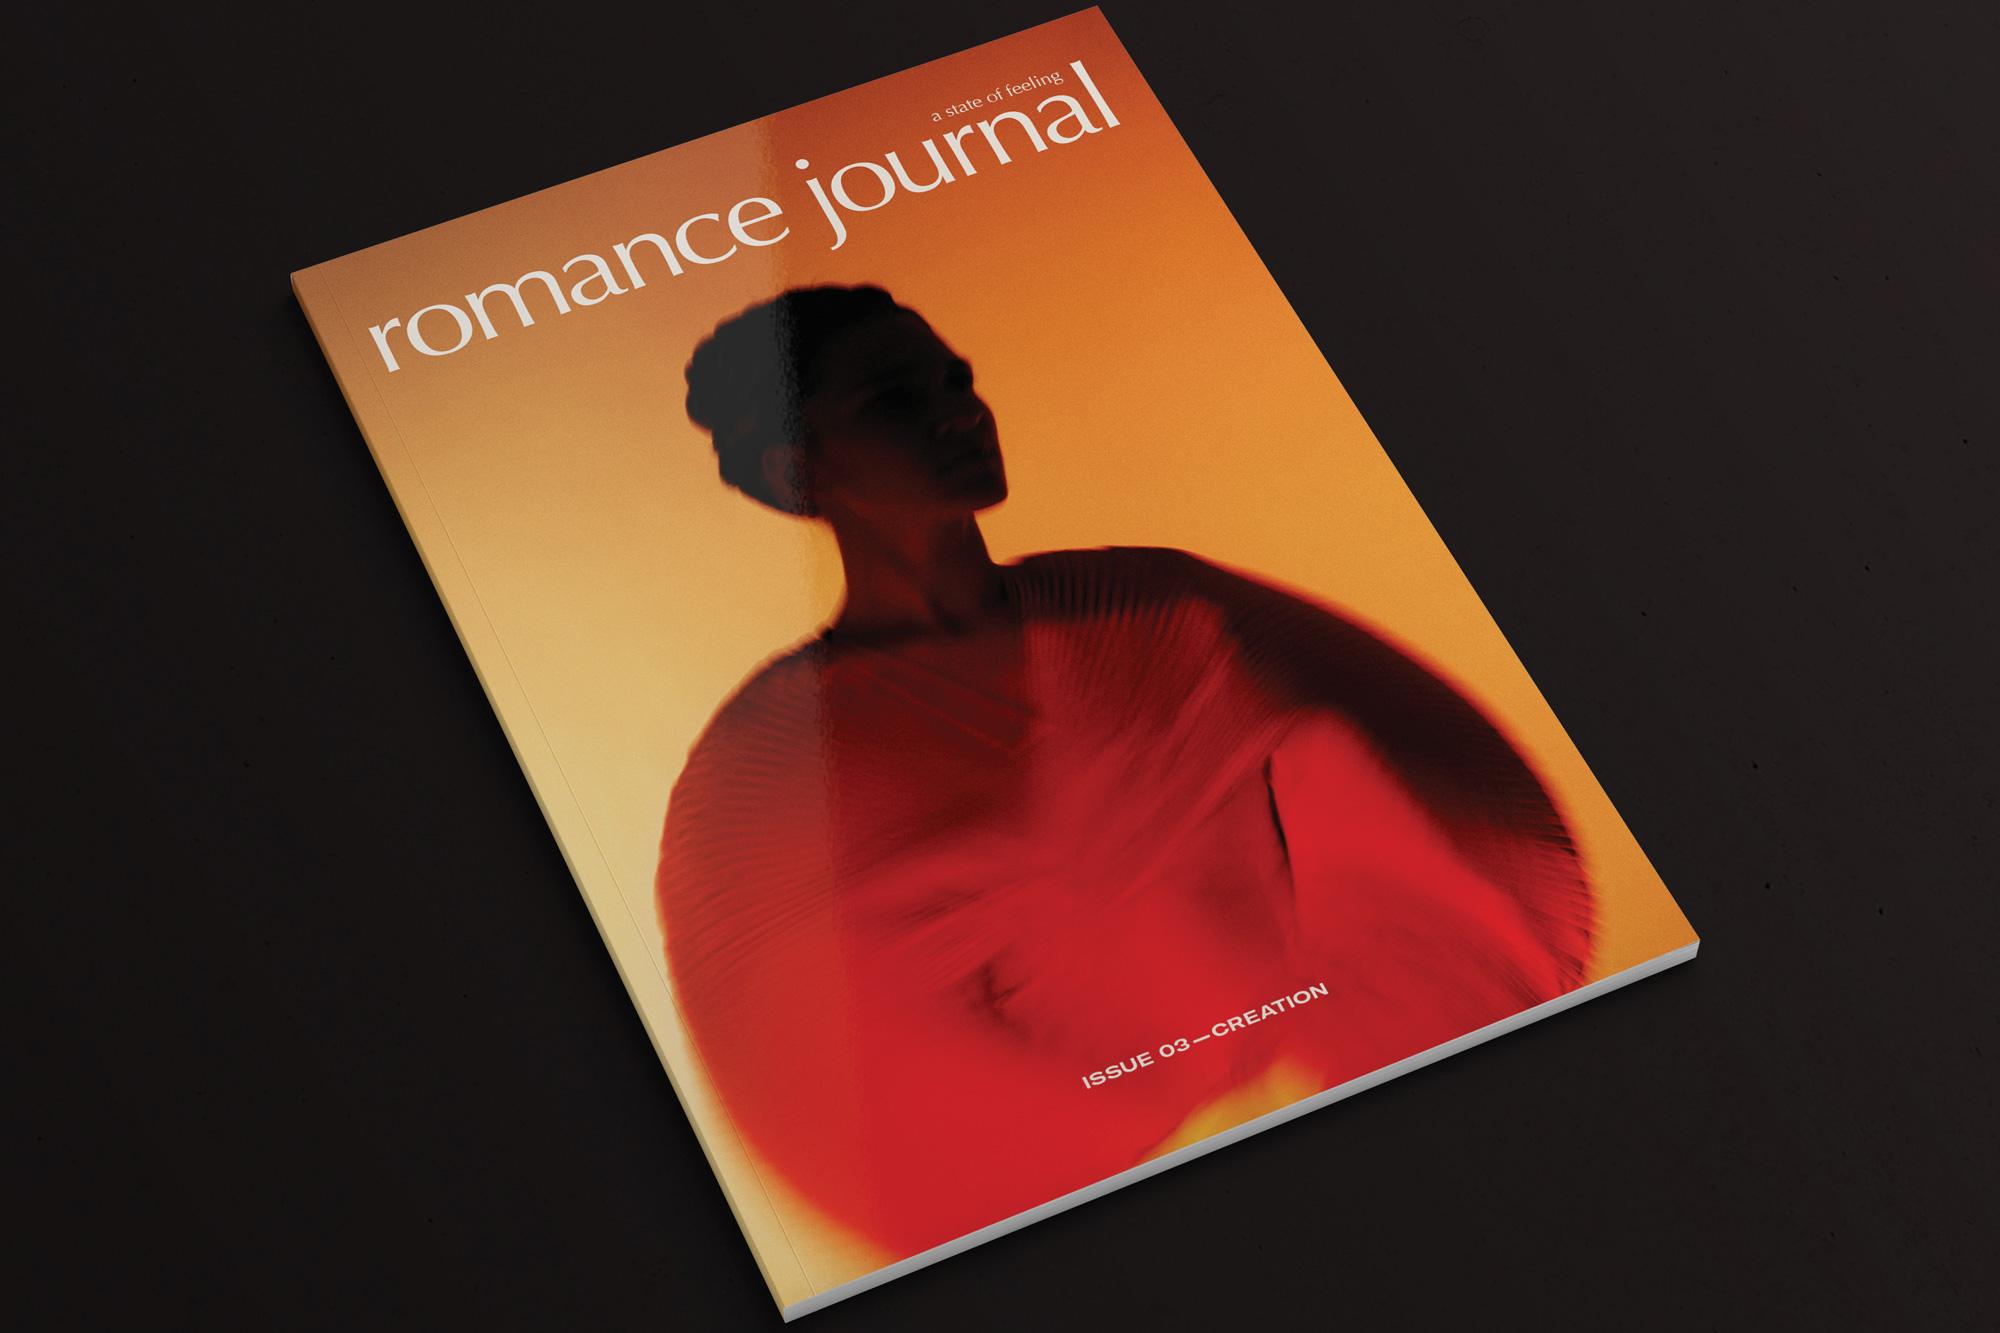 sixtysix romance journal cover